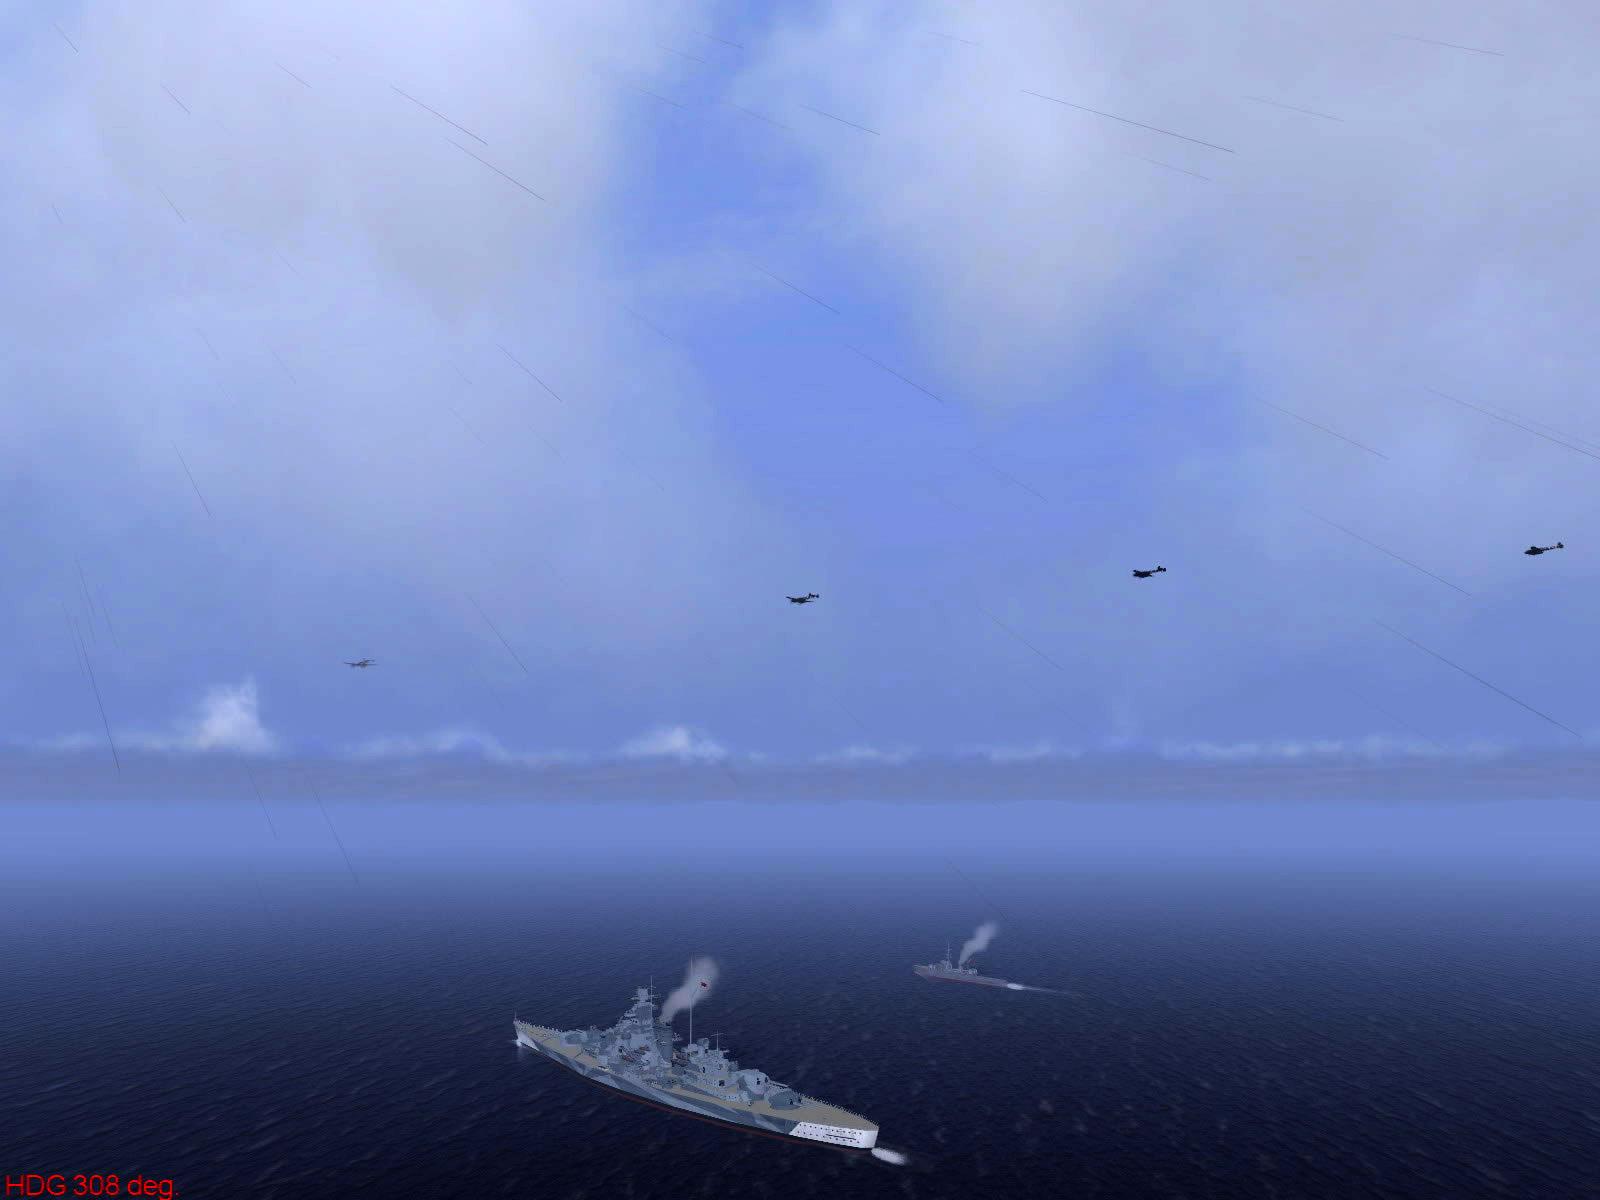 Ubisoft IL2 Sturmovik game version of Operation Donnerkeil 02